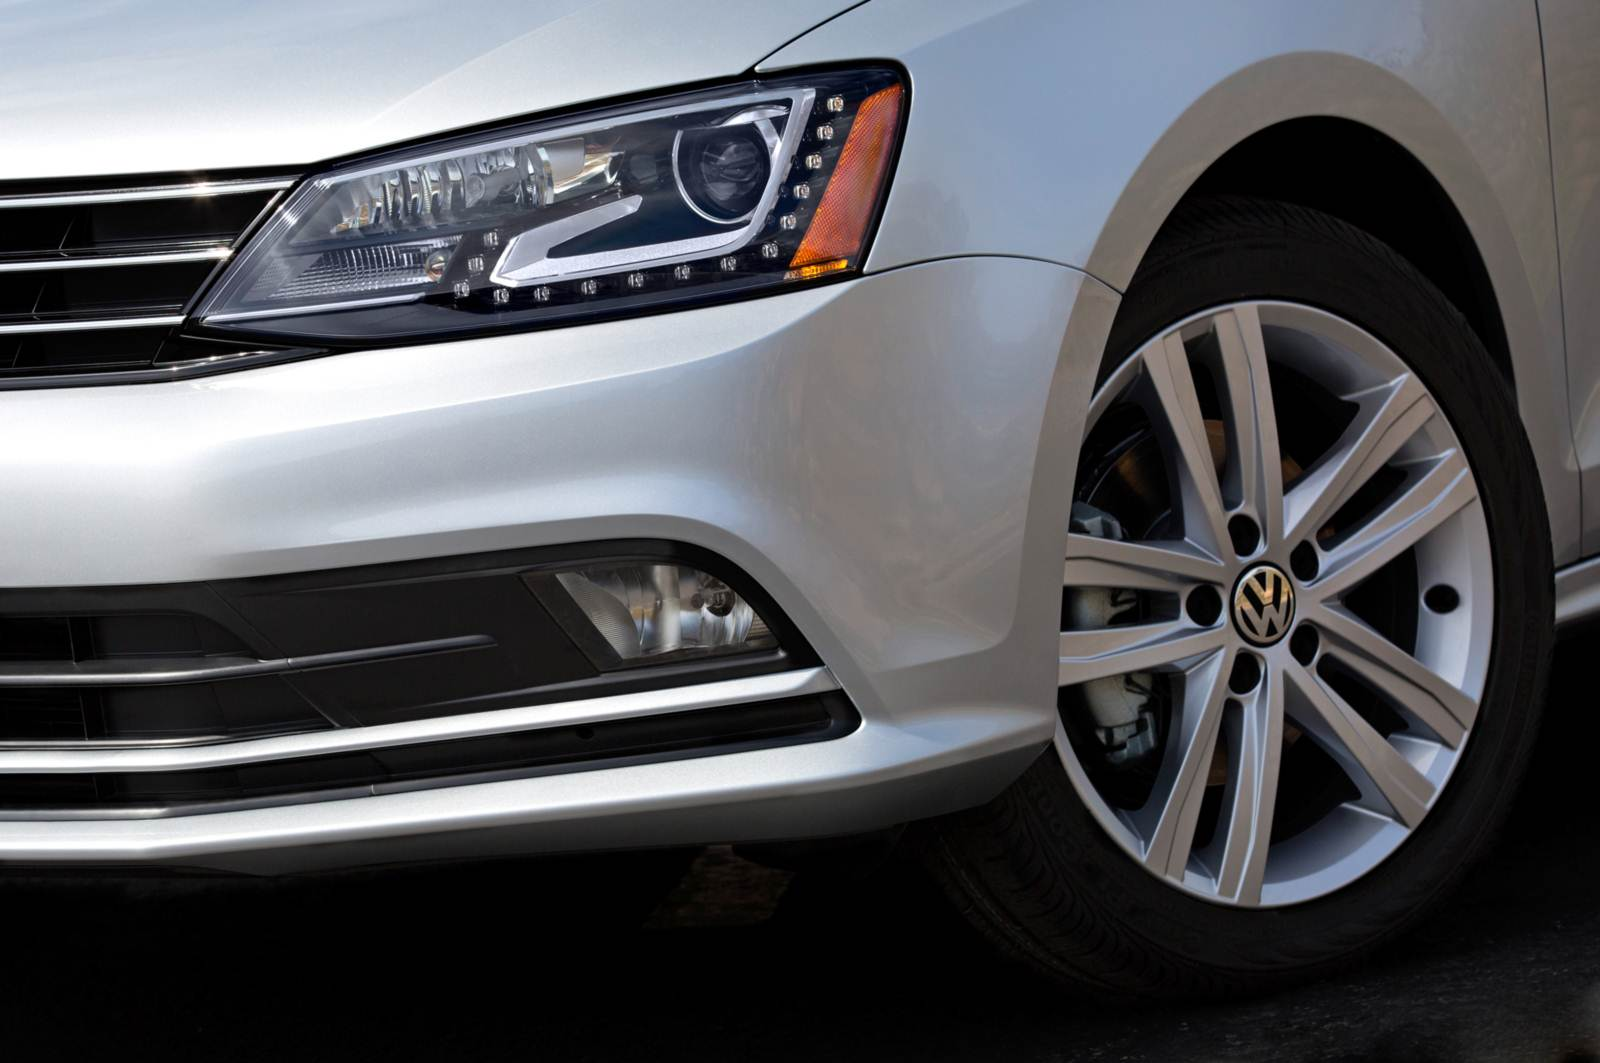 Novo Volkswagen Jetta 2015 - novos faróis de LED